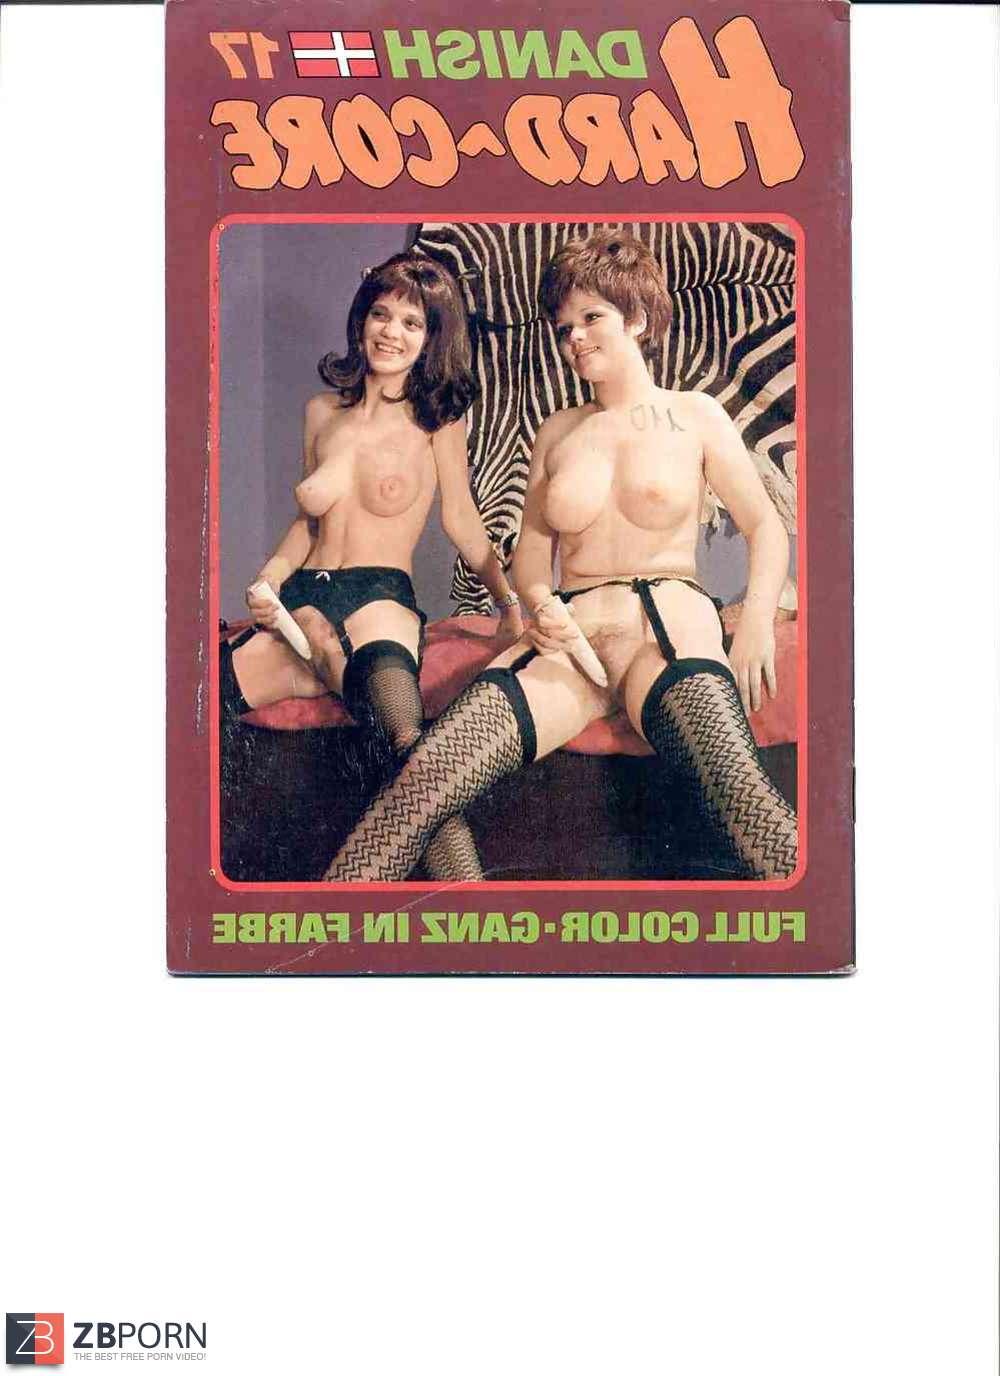 17 Porn Tube danish hard-core #17 - vintage mag / zb porn